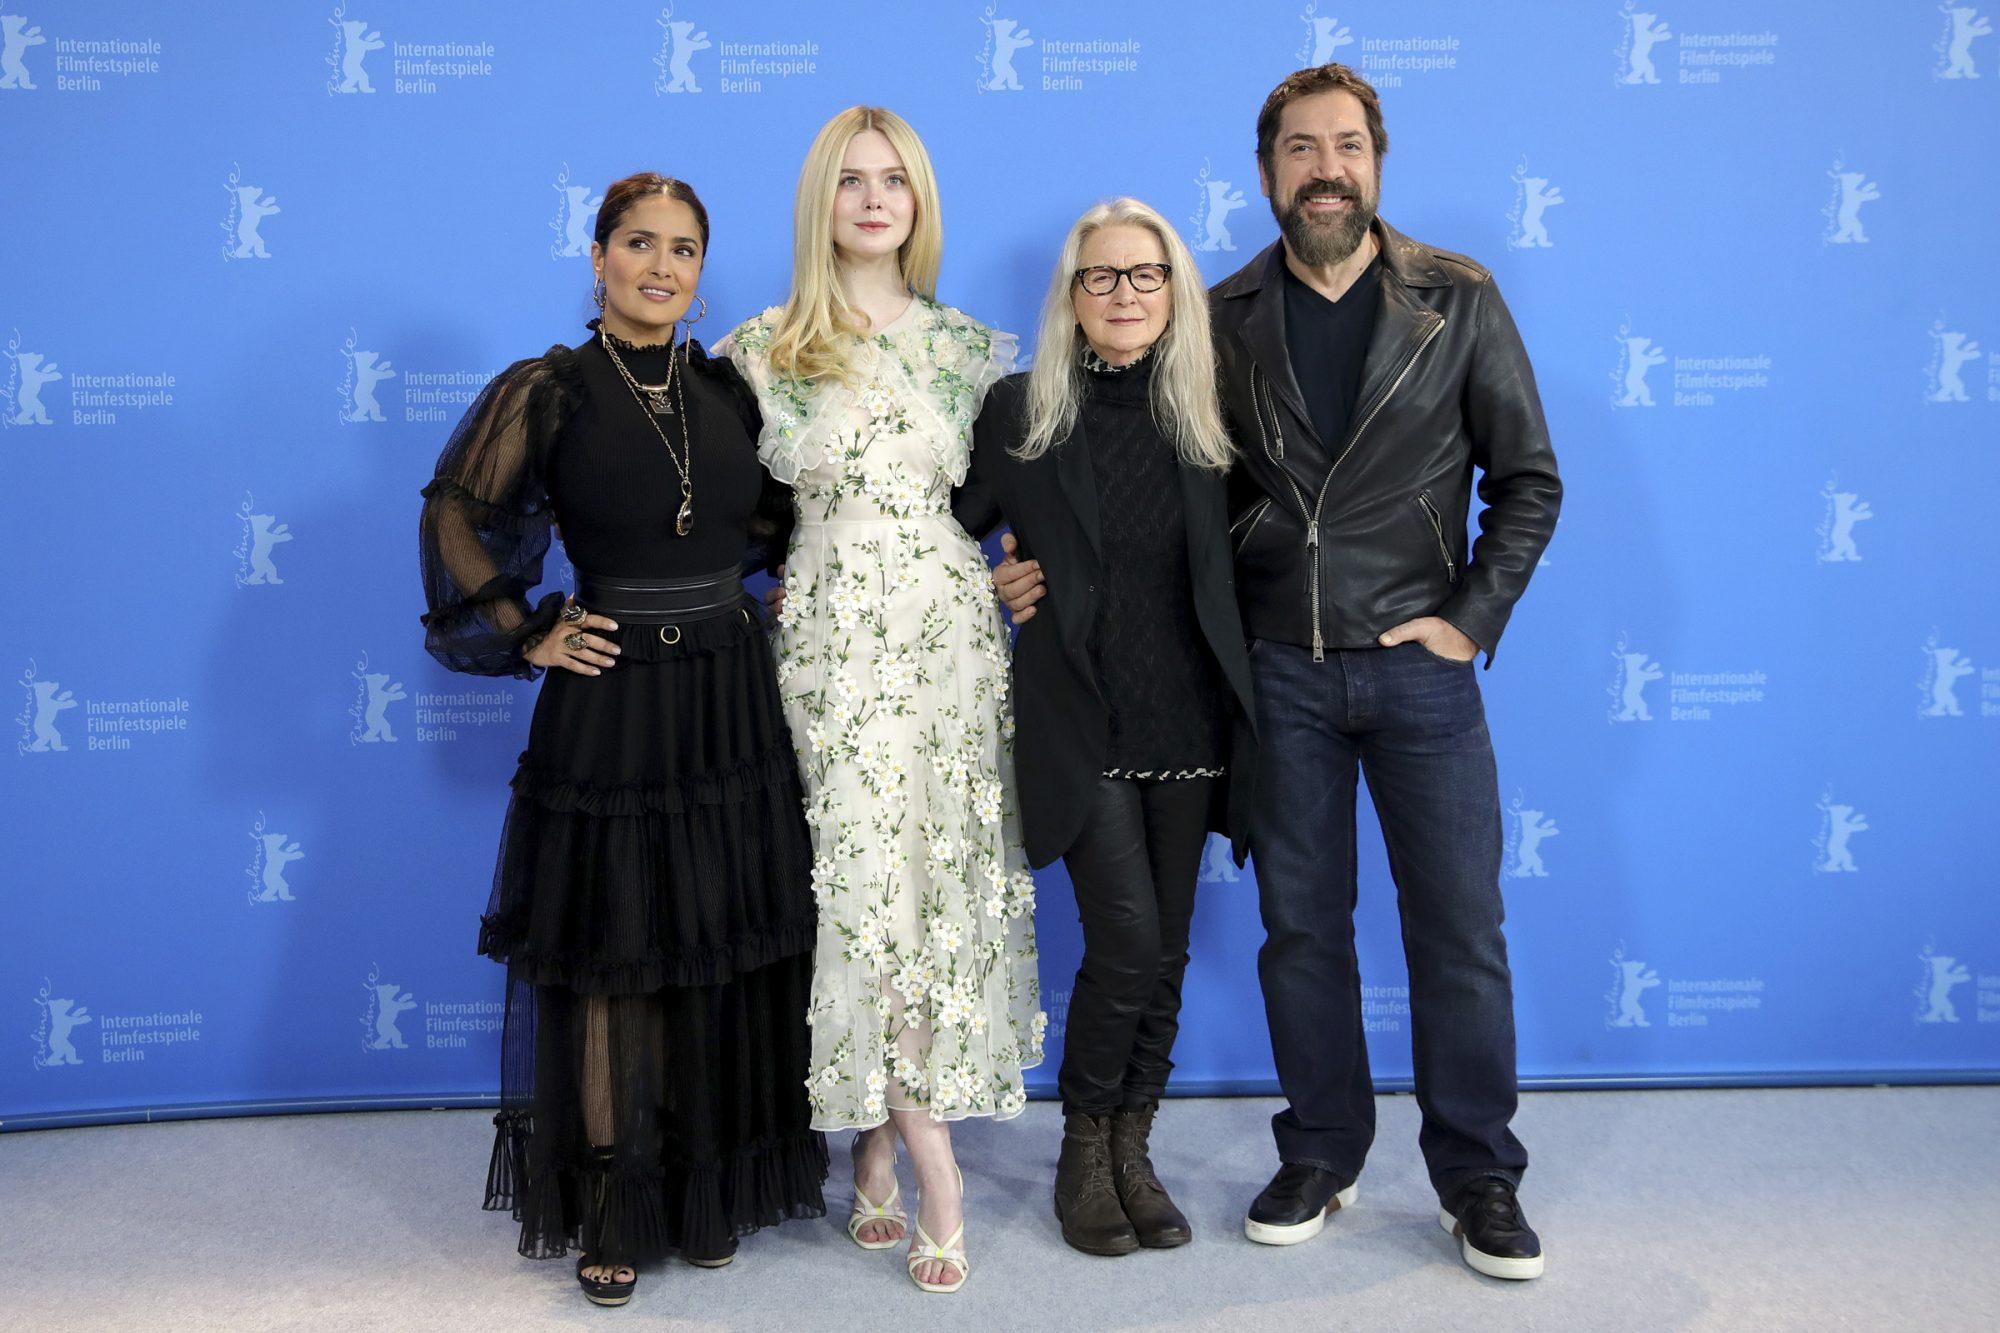 Salma Hayek, Elle Fanning director Sally Potter and Javier Bardem